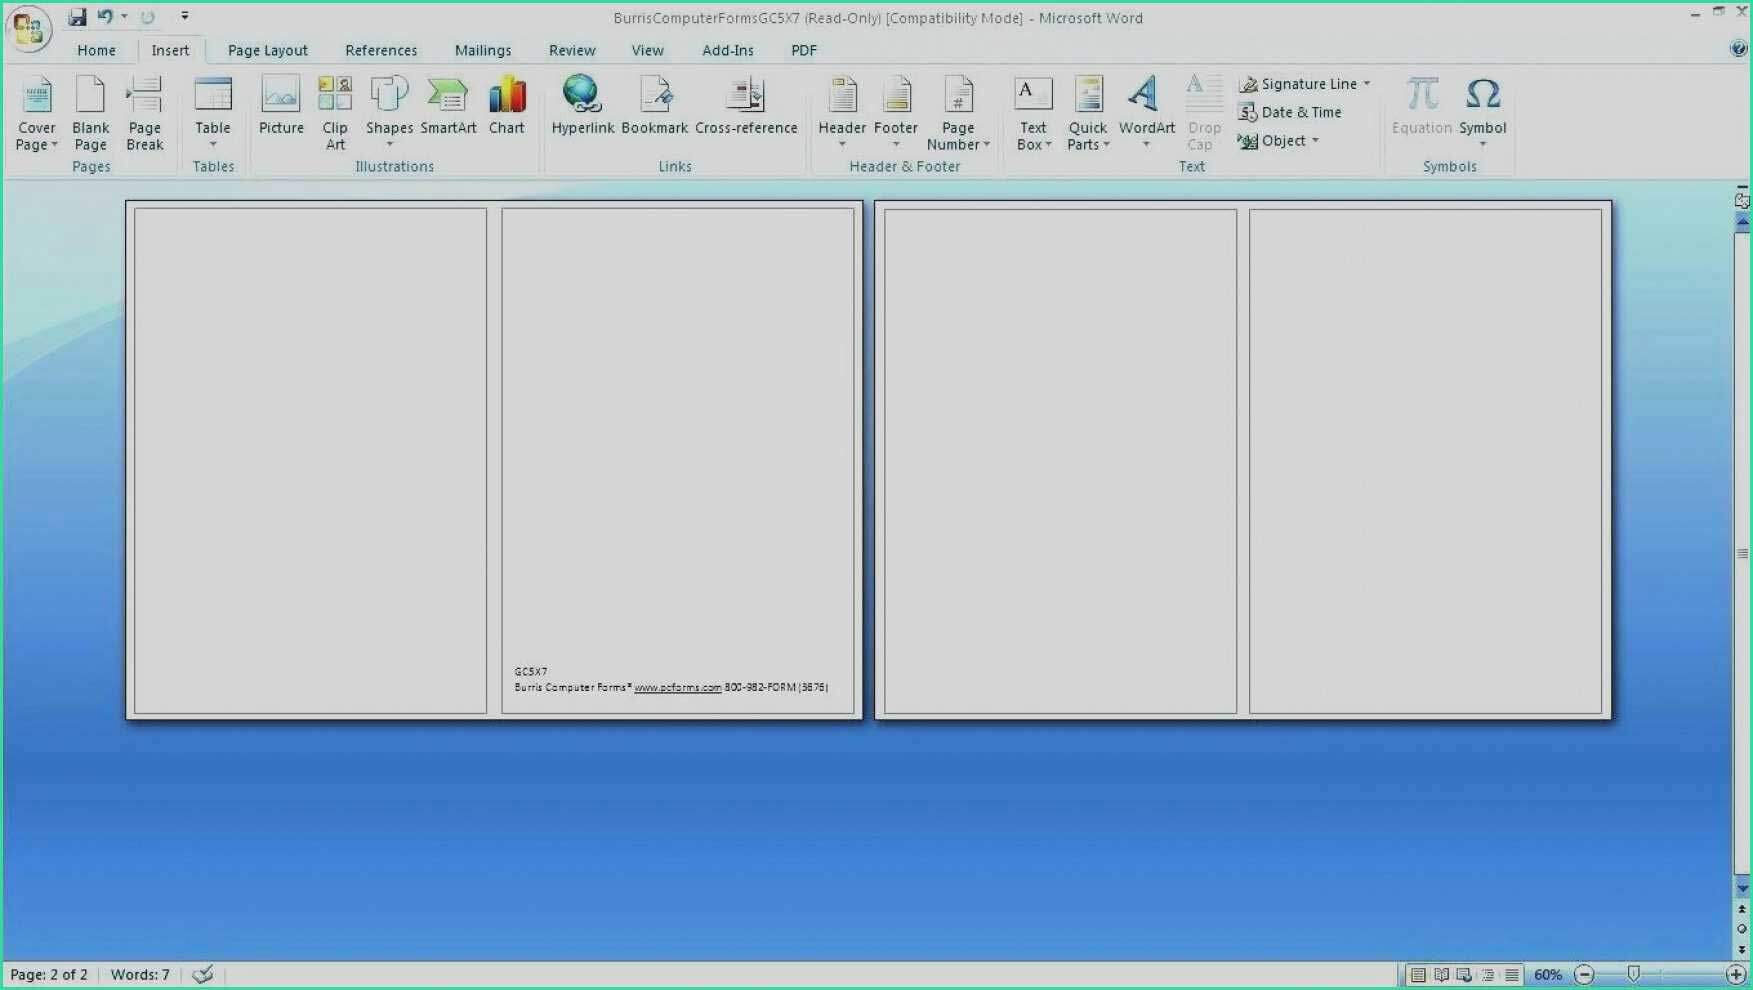 001 Template Ideas Blank Quarter Fold Card Microsoft Word regarding Blank Quarter Fold Card Template